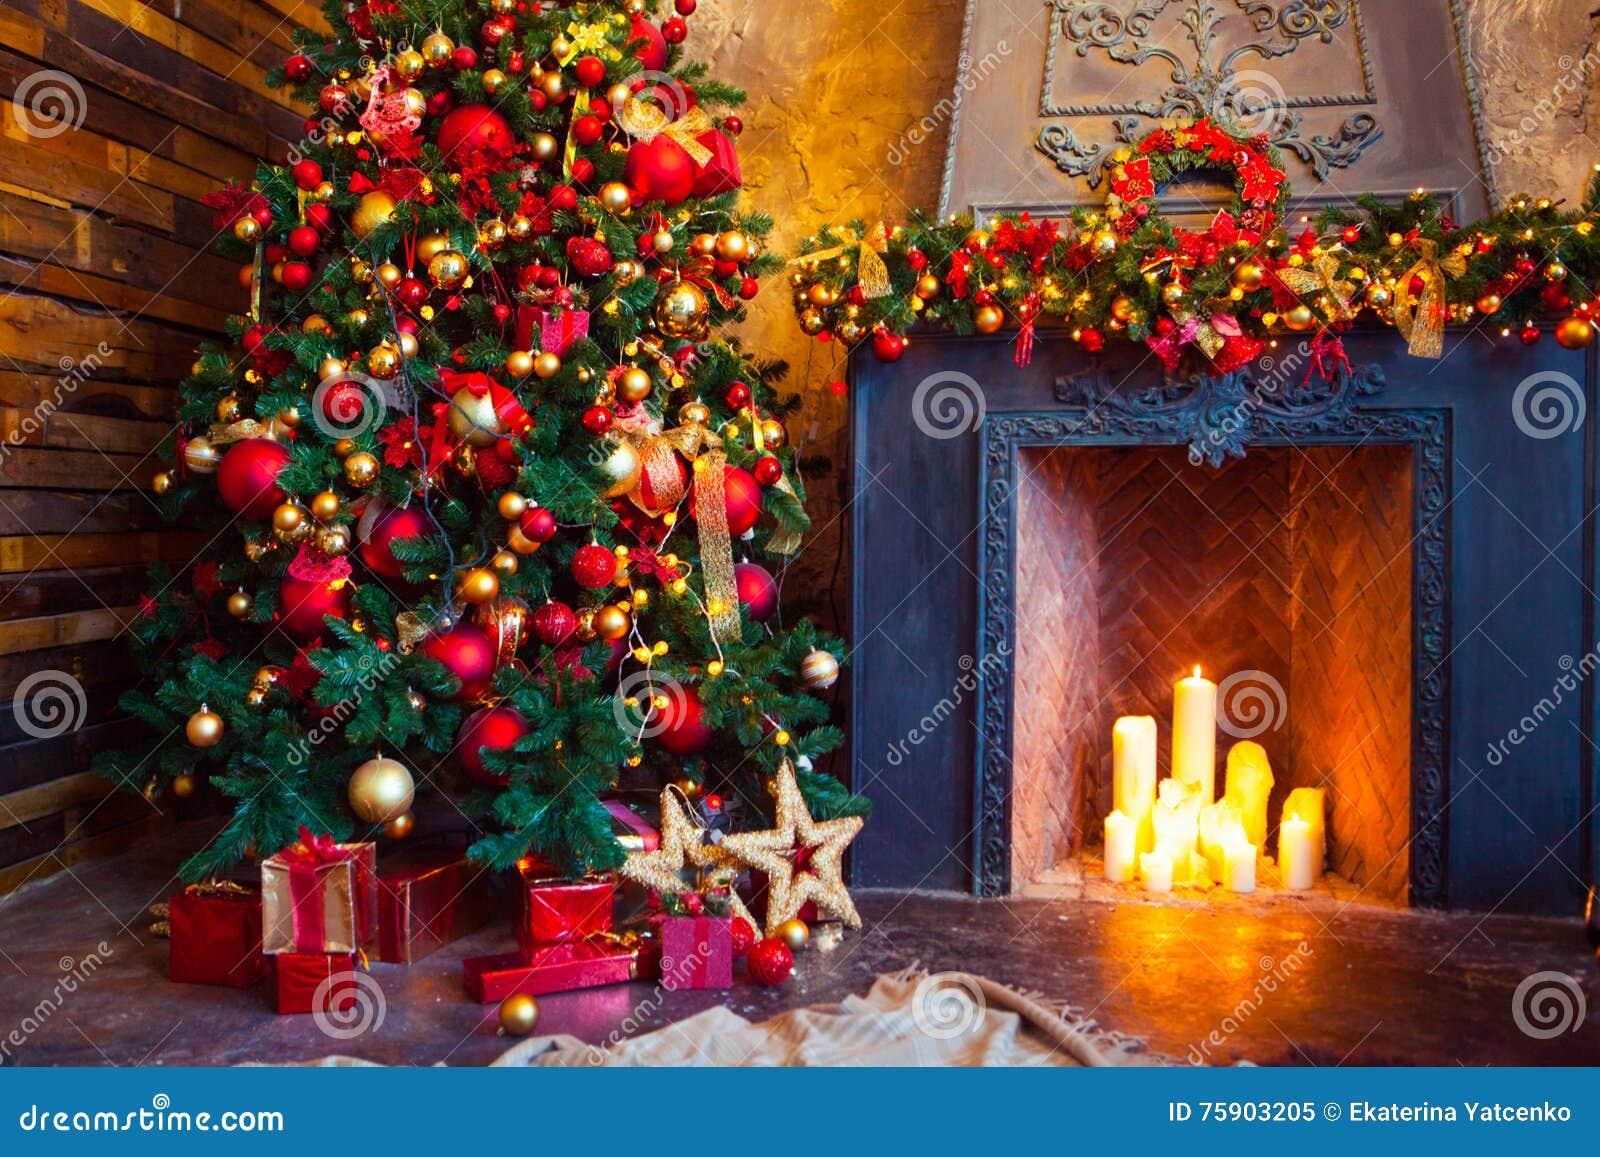 Christmas Room Interior Design Xmas Tree Decorated By Lights Pr Stock Photo Image 75903205